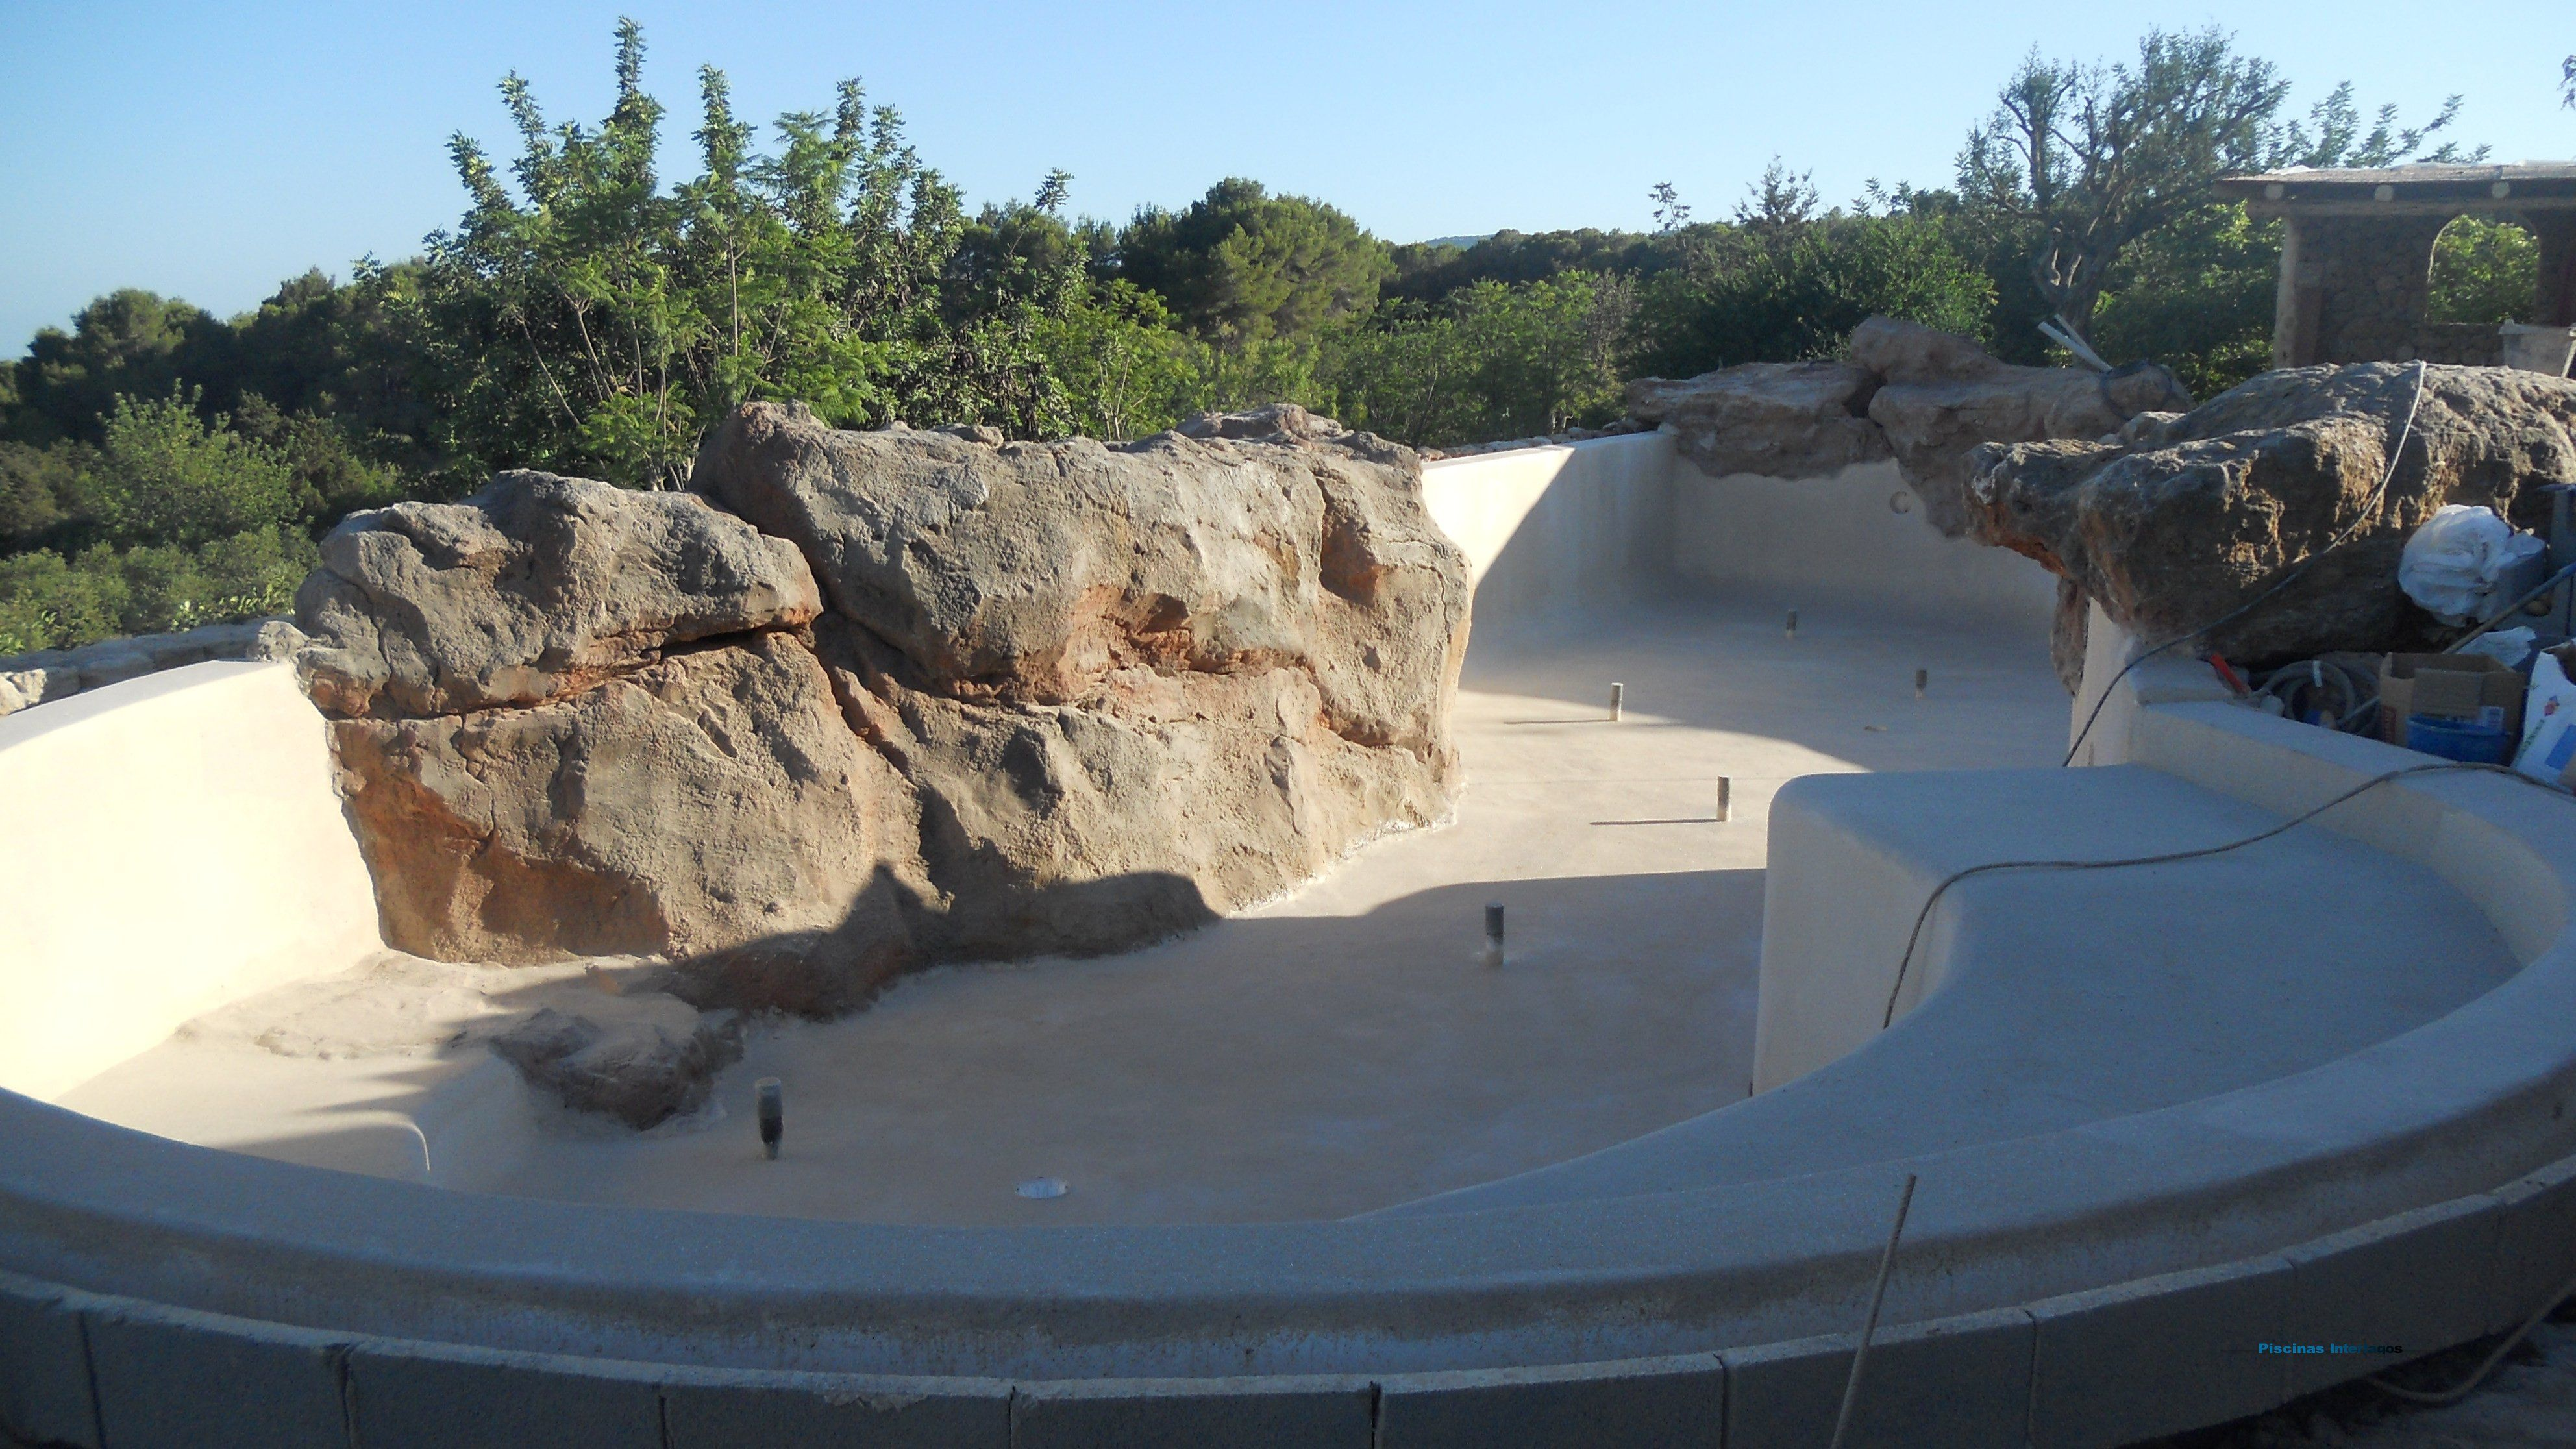 Per metro piscina de arena en construcci n piscinas for Piscina de arena construccion